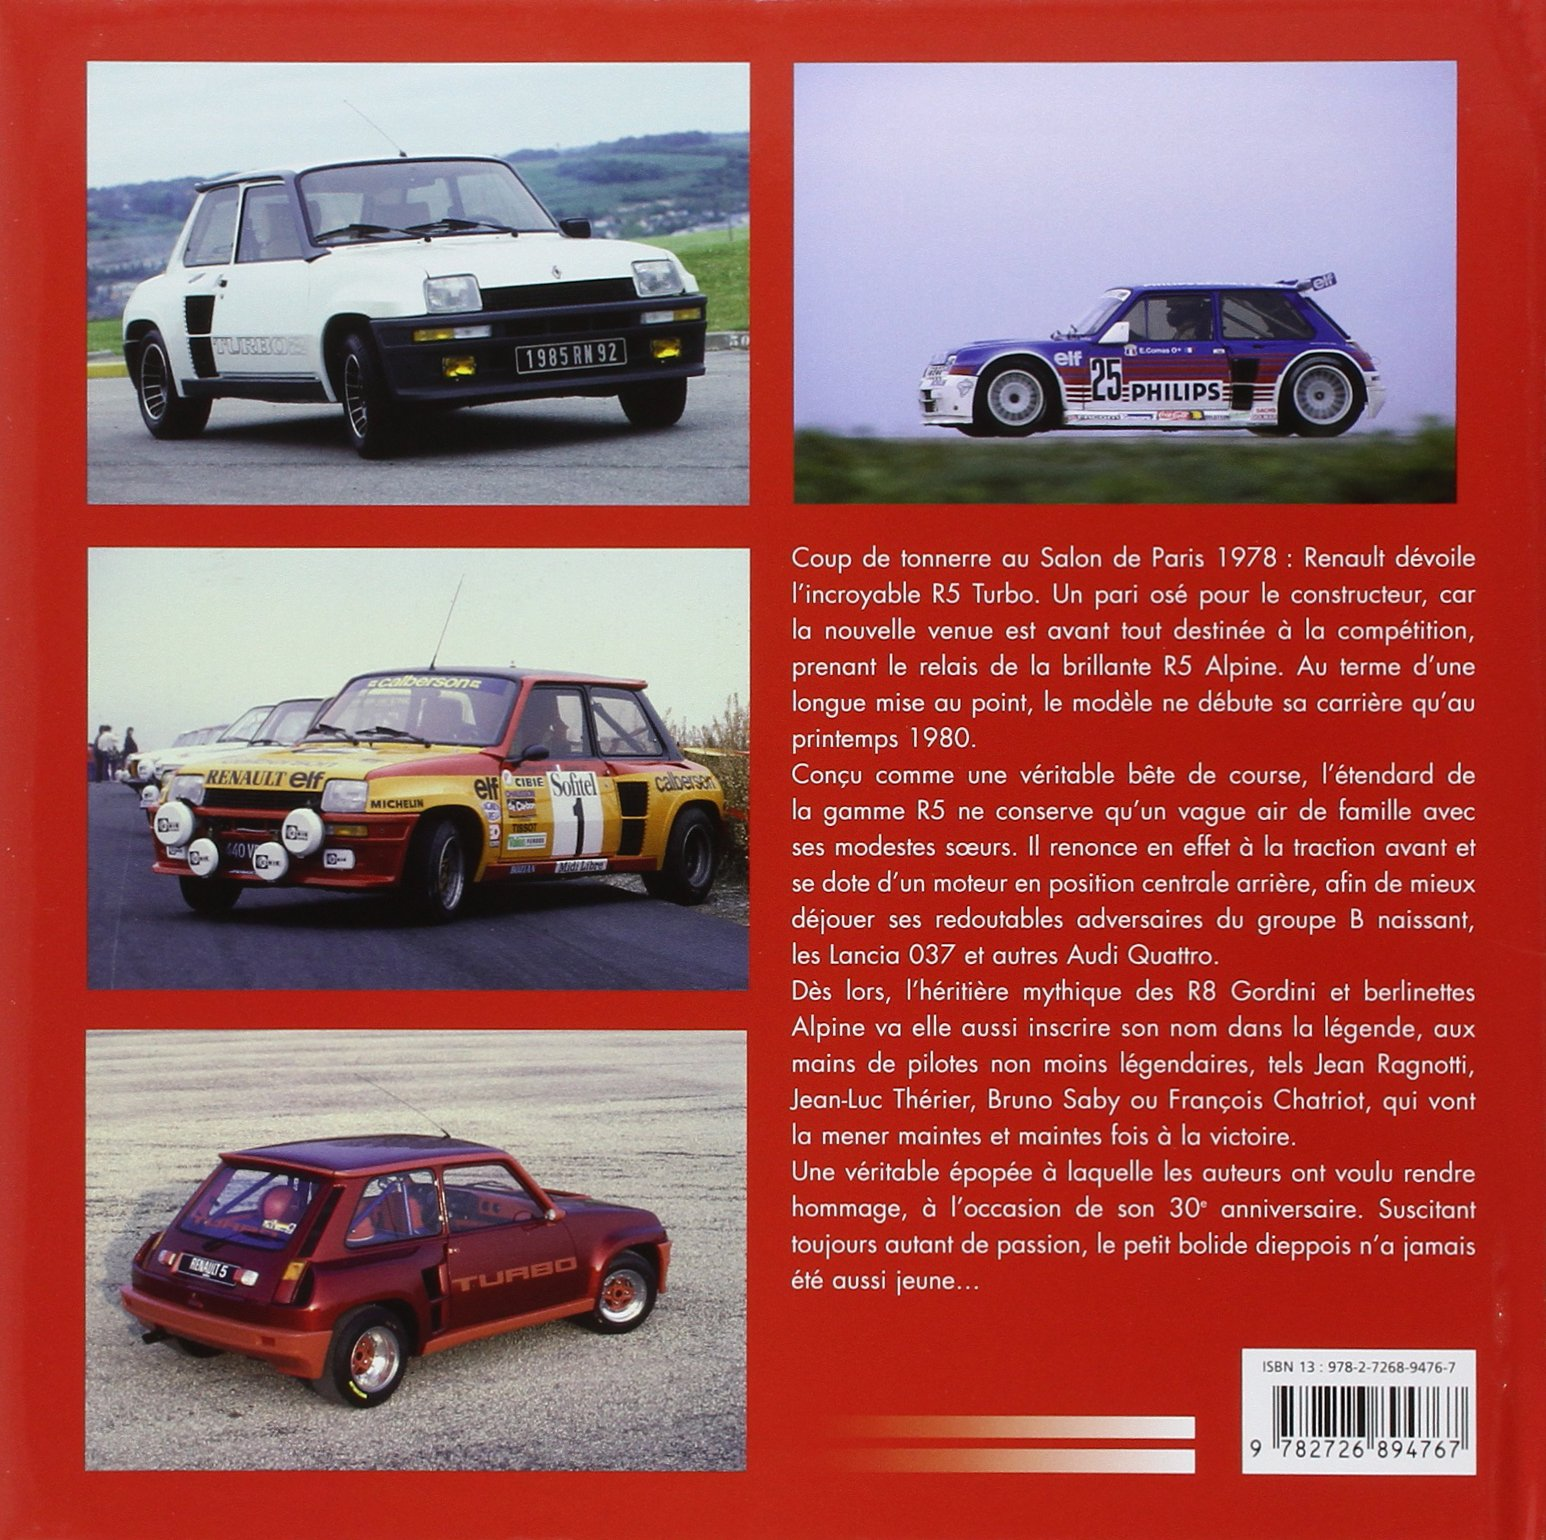 Renault 5 Turbo : Lenfant terrible de la régie: Amazon.es: Xavier Chauvin, Bernard Canonne, François Chatriot: Libros en idiomas extranjeros